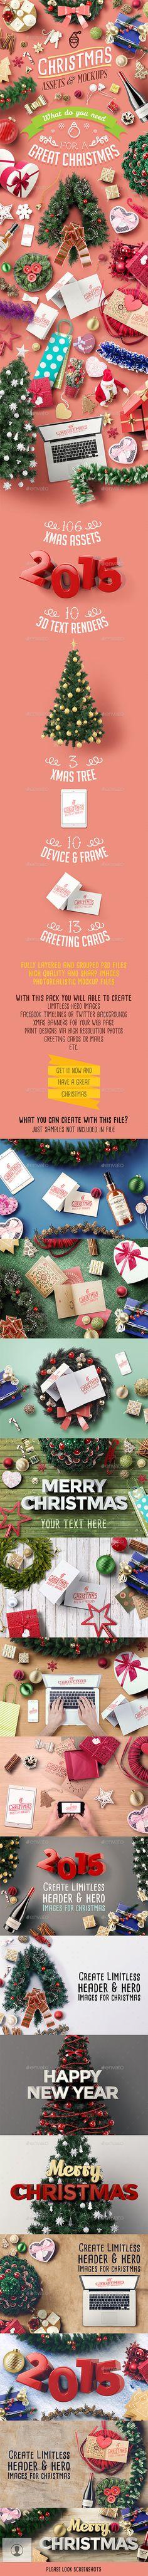 Christmas Assets And Mock Ups | Download: http://graphicriver.net/item/christmas-assets-and-mock-ups/9591143?ref=ksioks